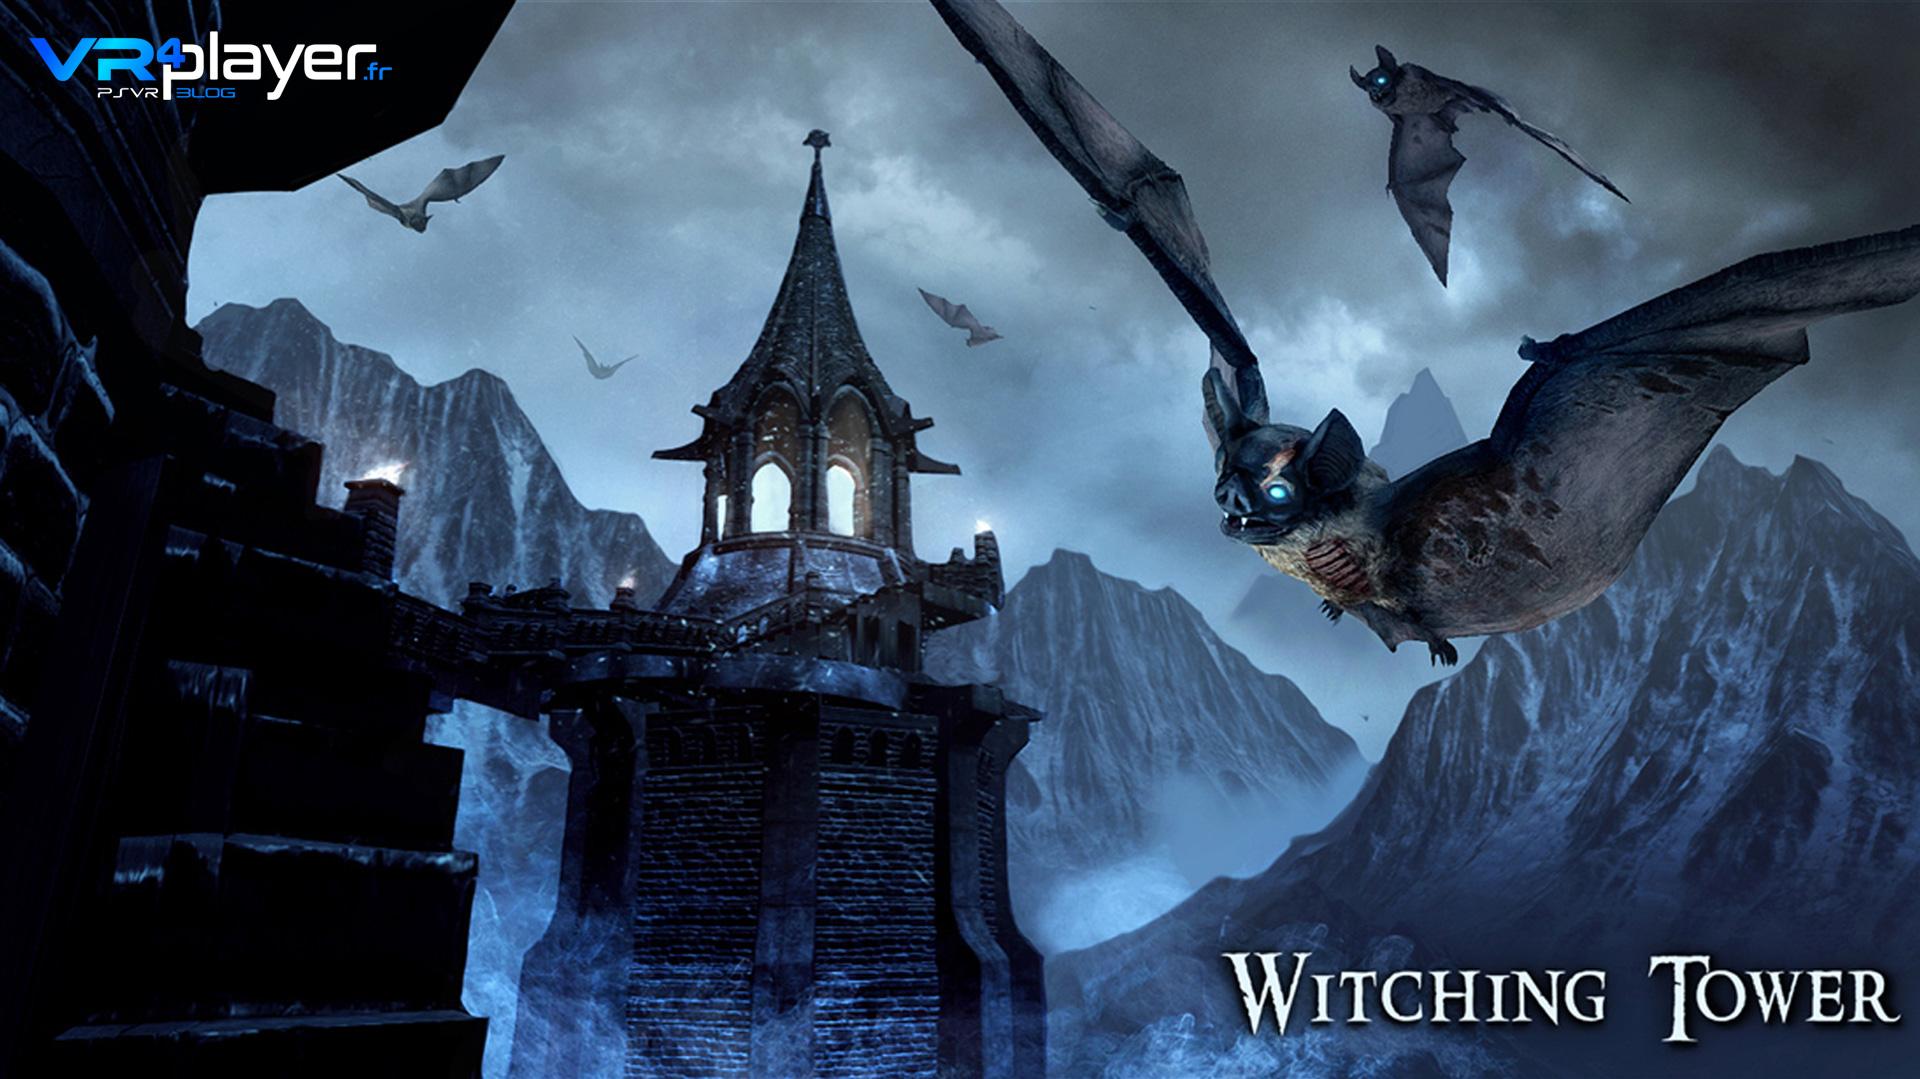 Witching Tower PSVR vrplayer.fr